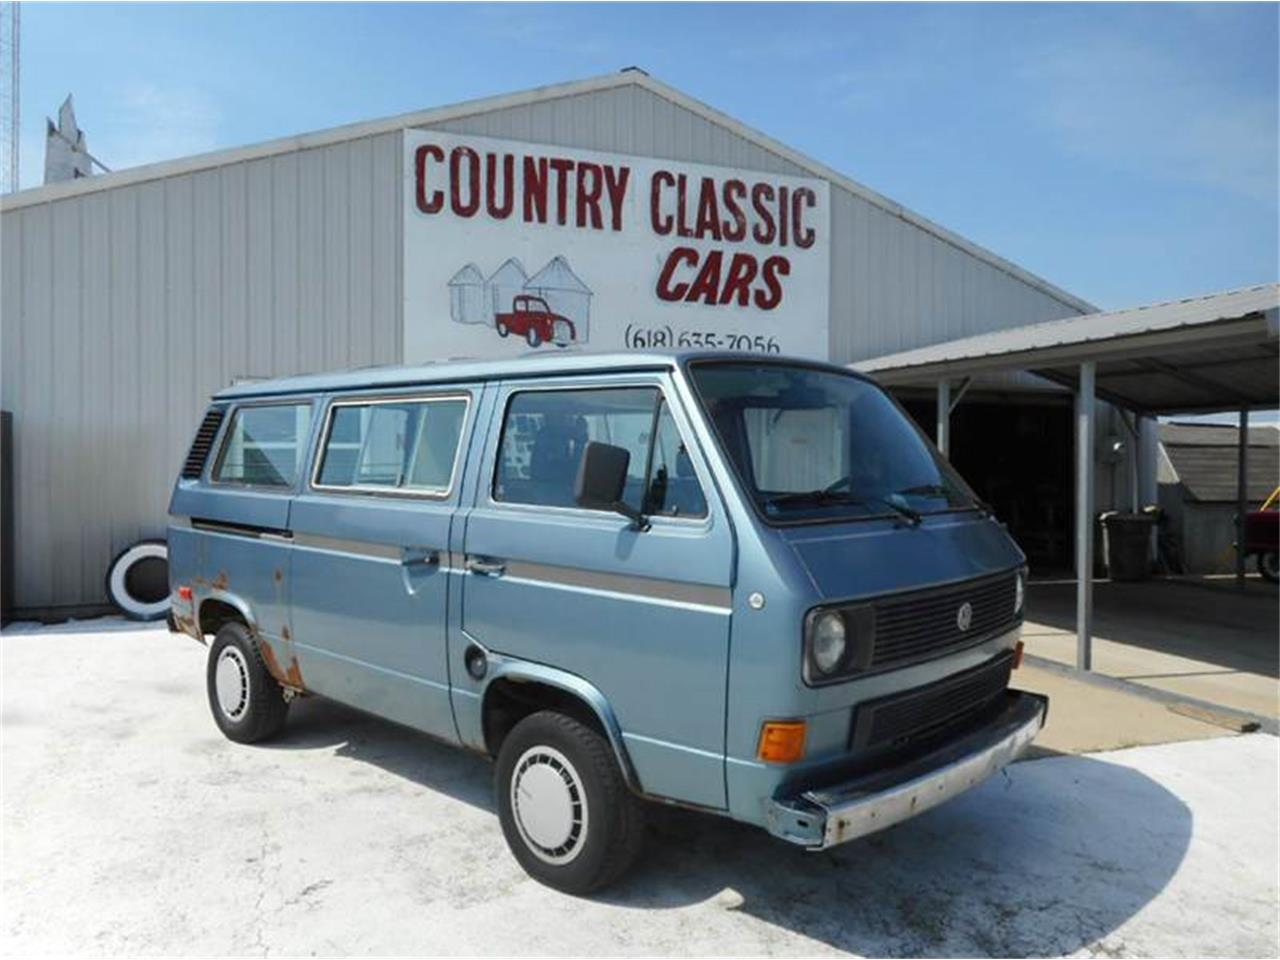 Large Picture of '84 Volkswagen Vanagon located in Staunton Illinois - $4,250.00 - LFRT